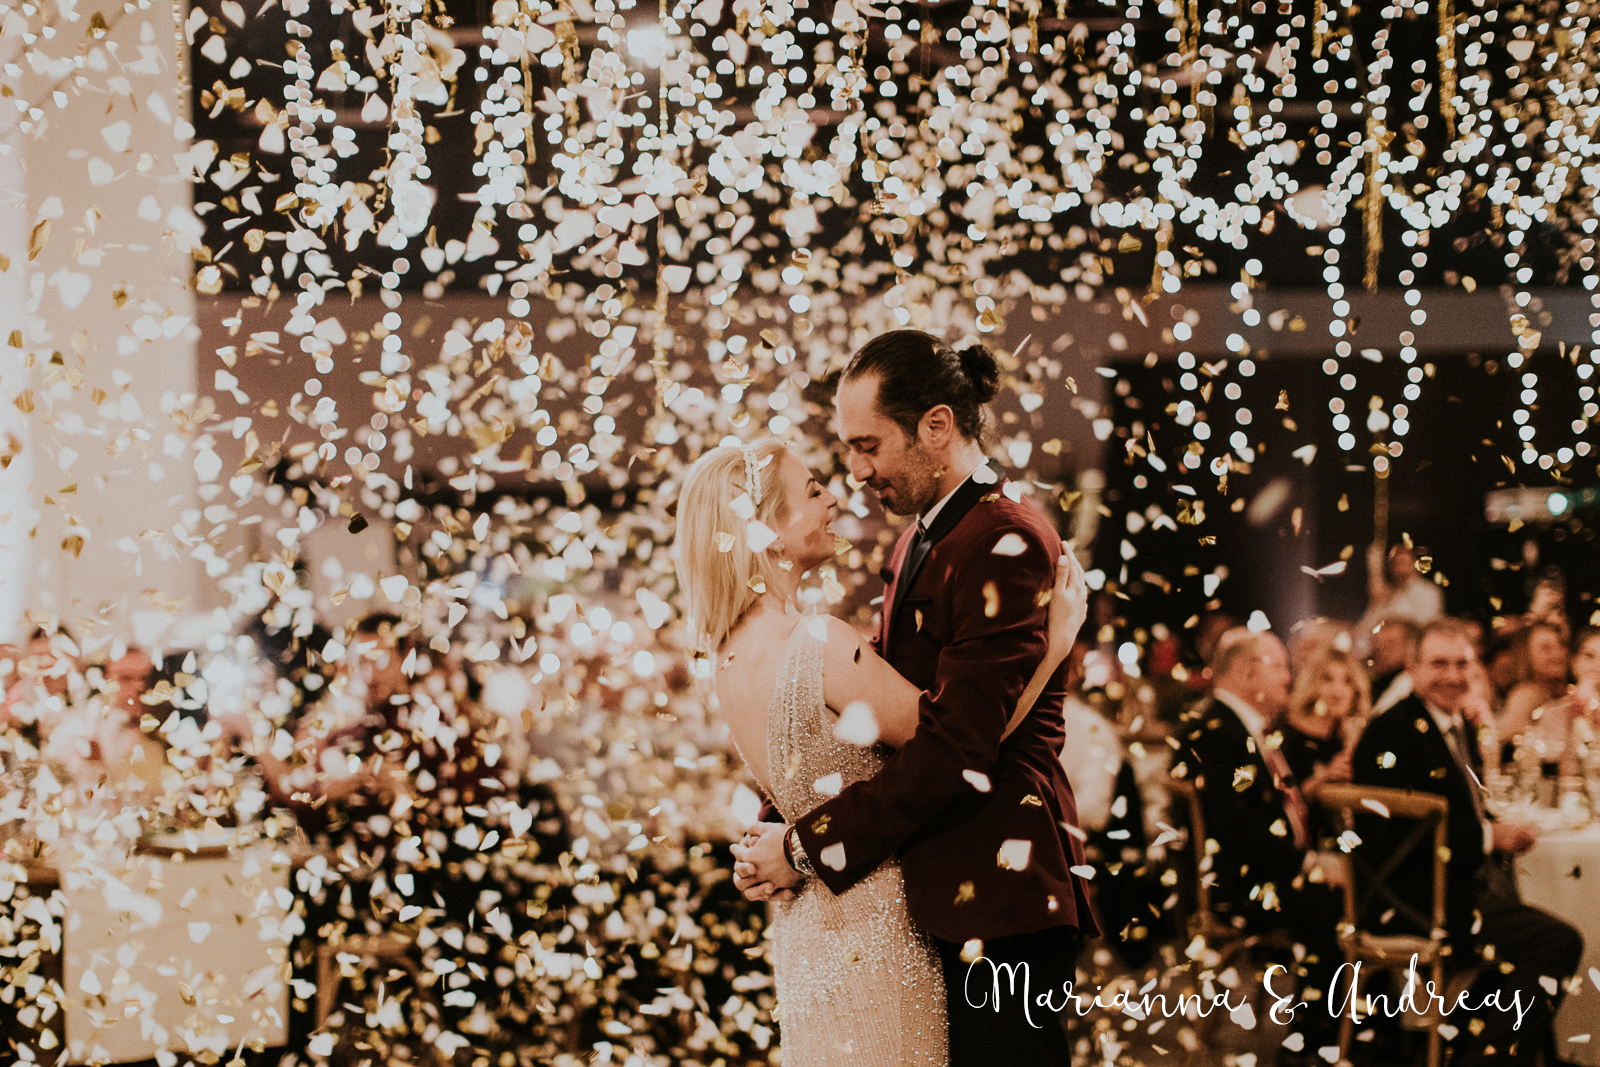 new-years-eve-wedding-cyprus-cover.jpg